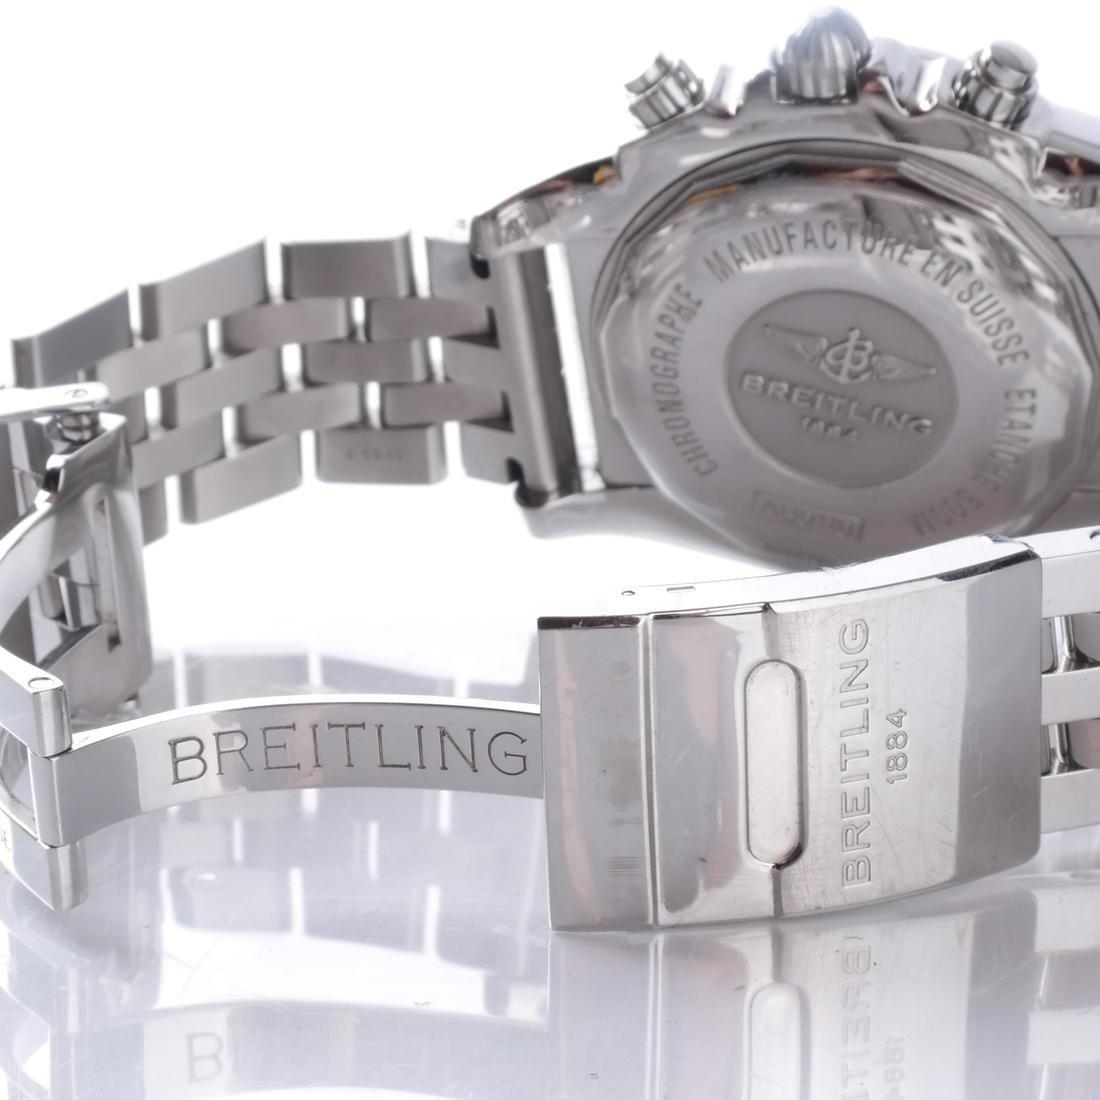 Breitling Chronomat AB0110 - 8